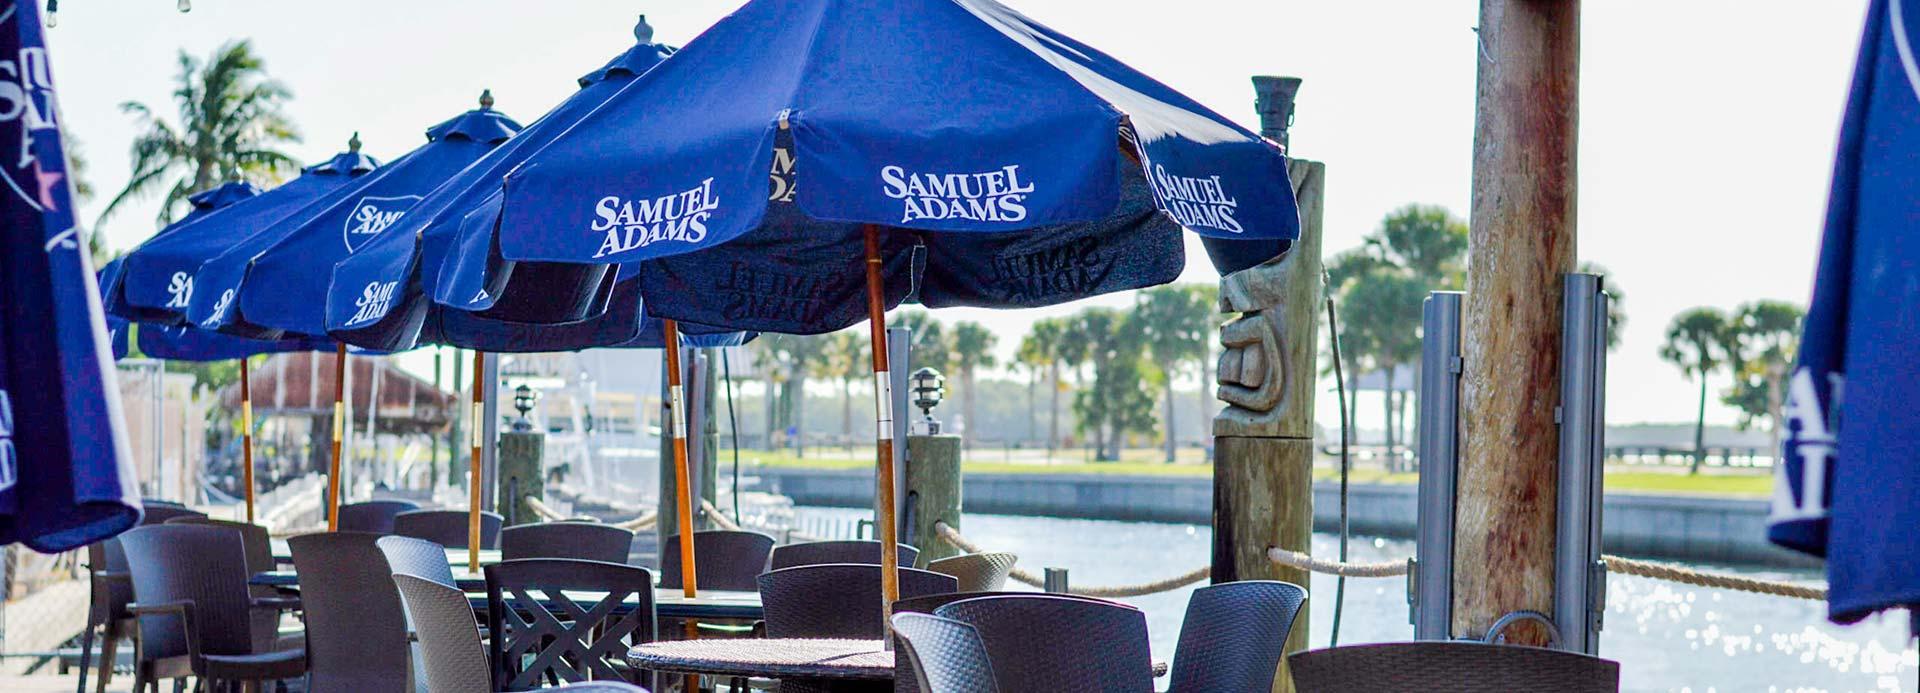 Restaurant & Tiki Bar on Manasota Key - SandBar Tiki & Grille